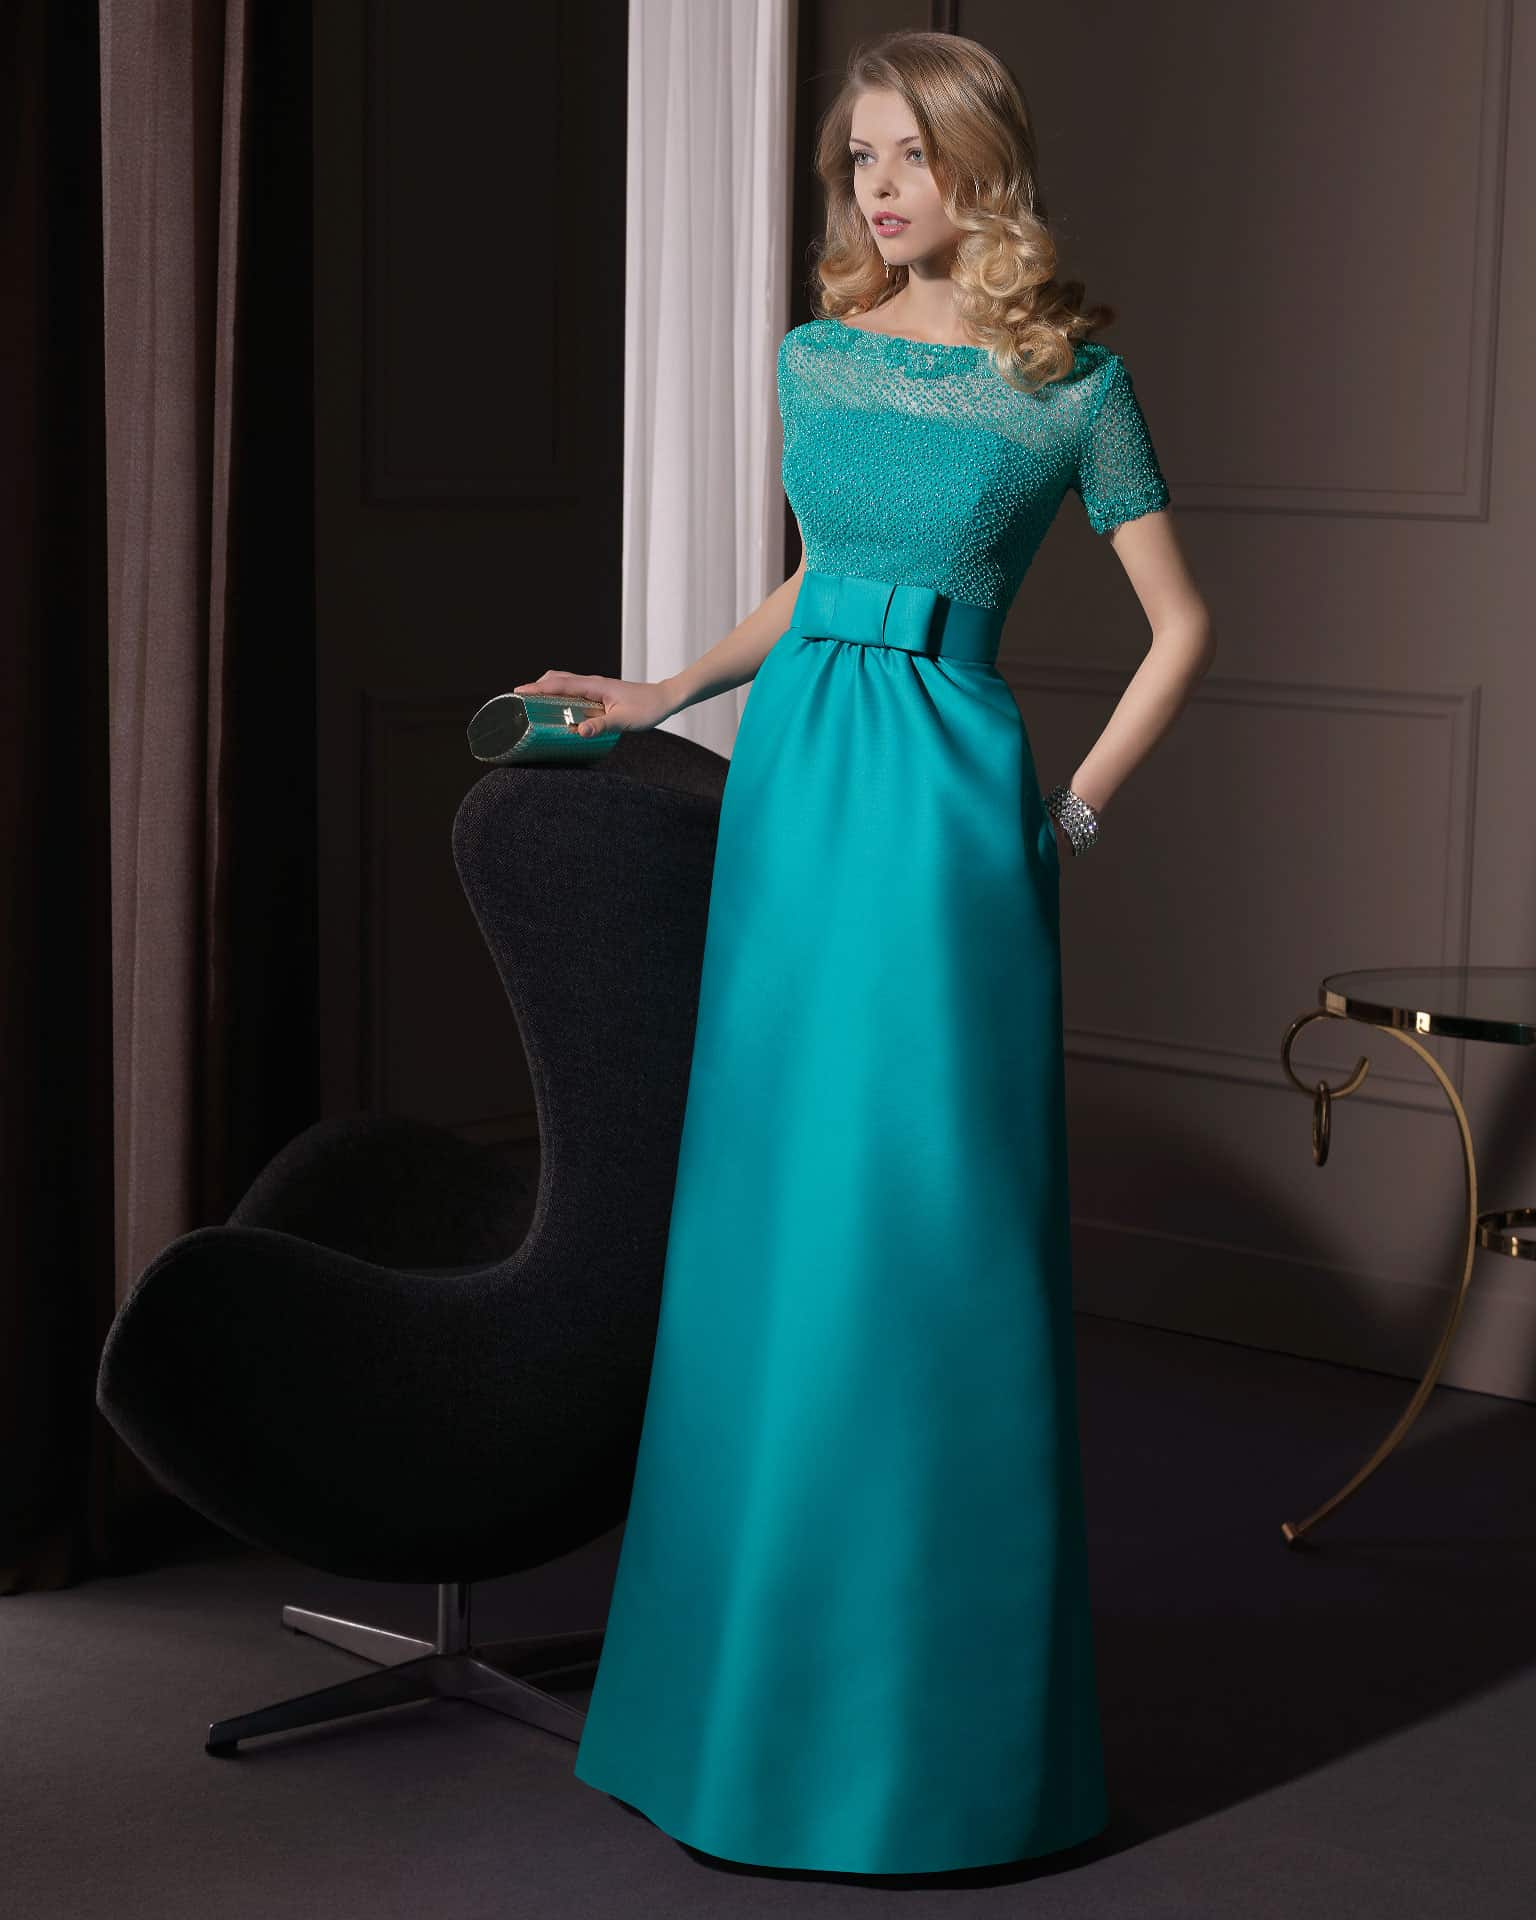 Modas de vestidos de fiesta para senoras gorditas